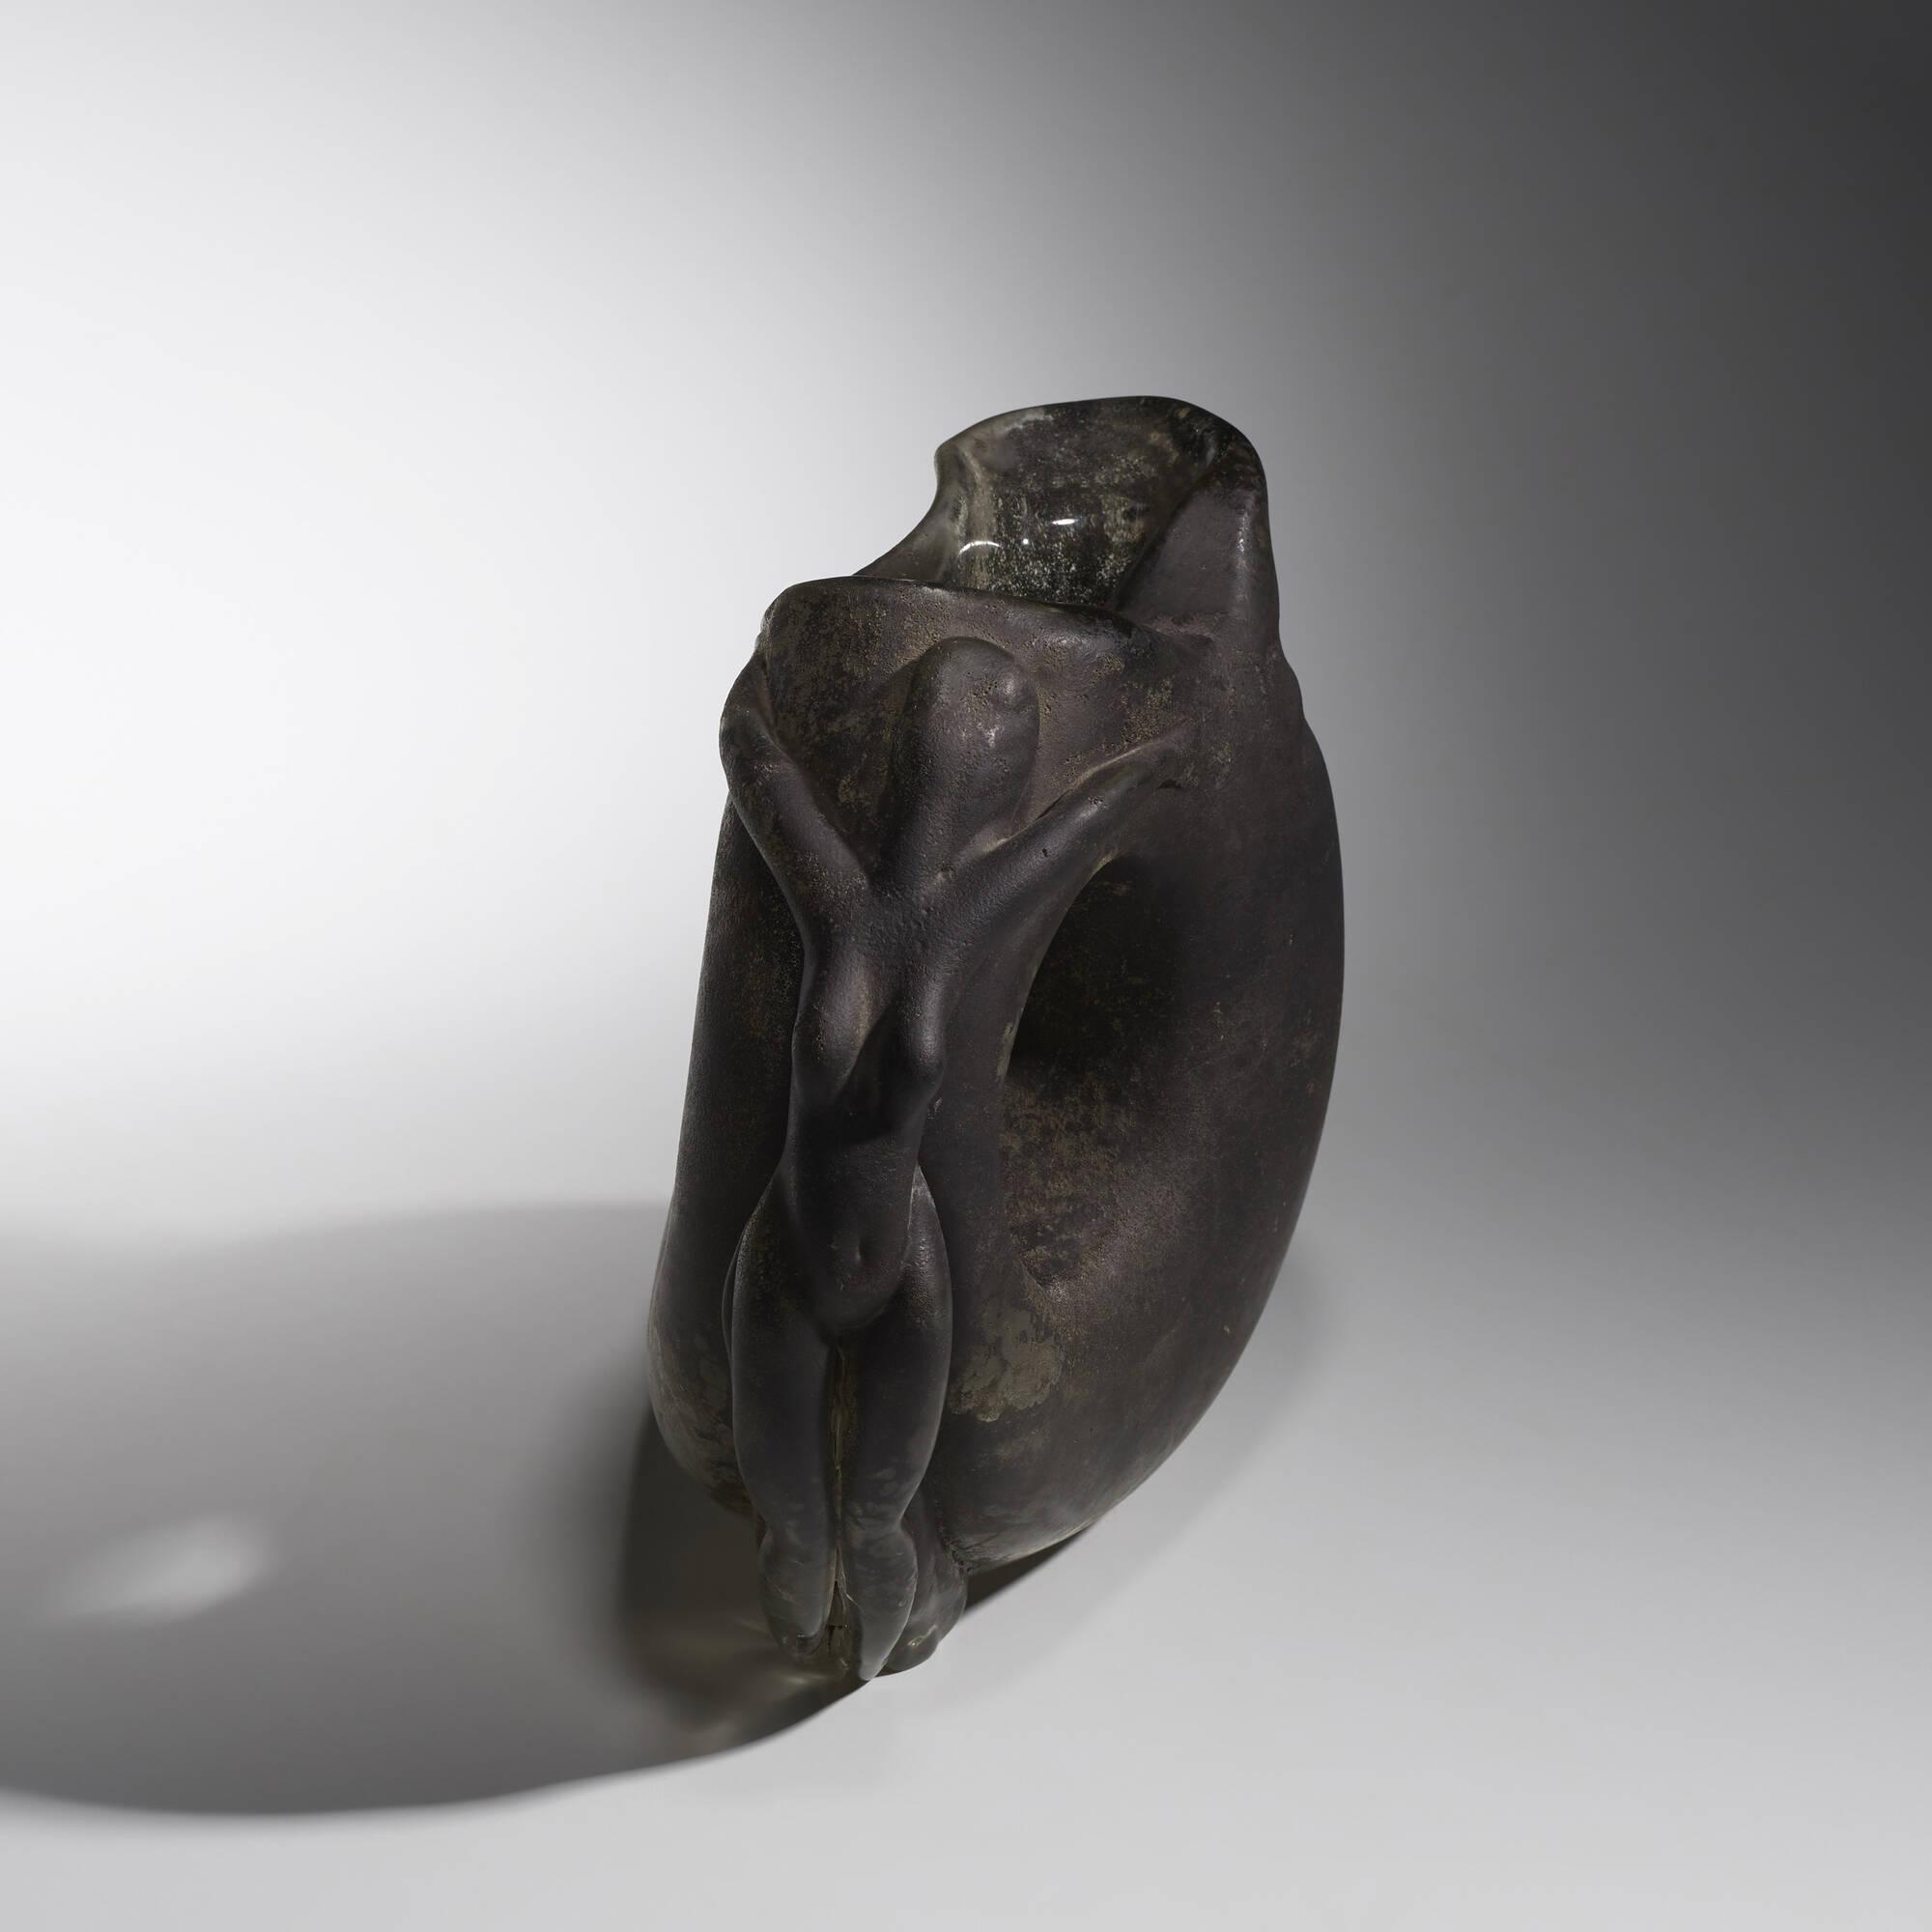 172: Ermanno Nason / vase with figural handle (2 of 3)